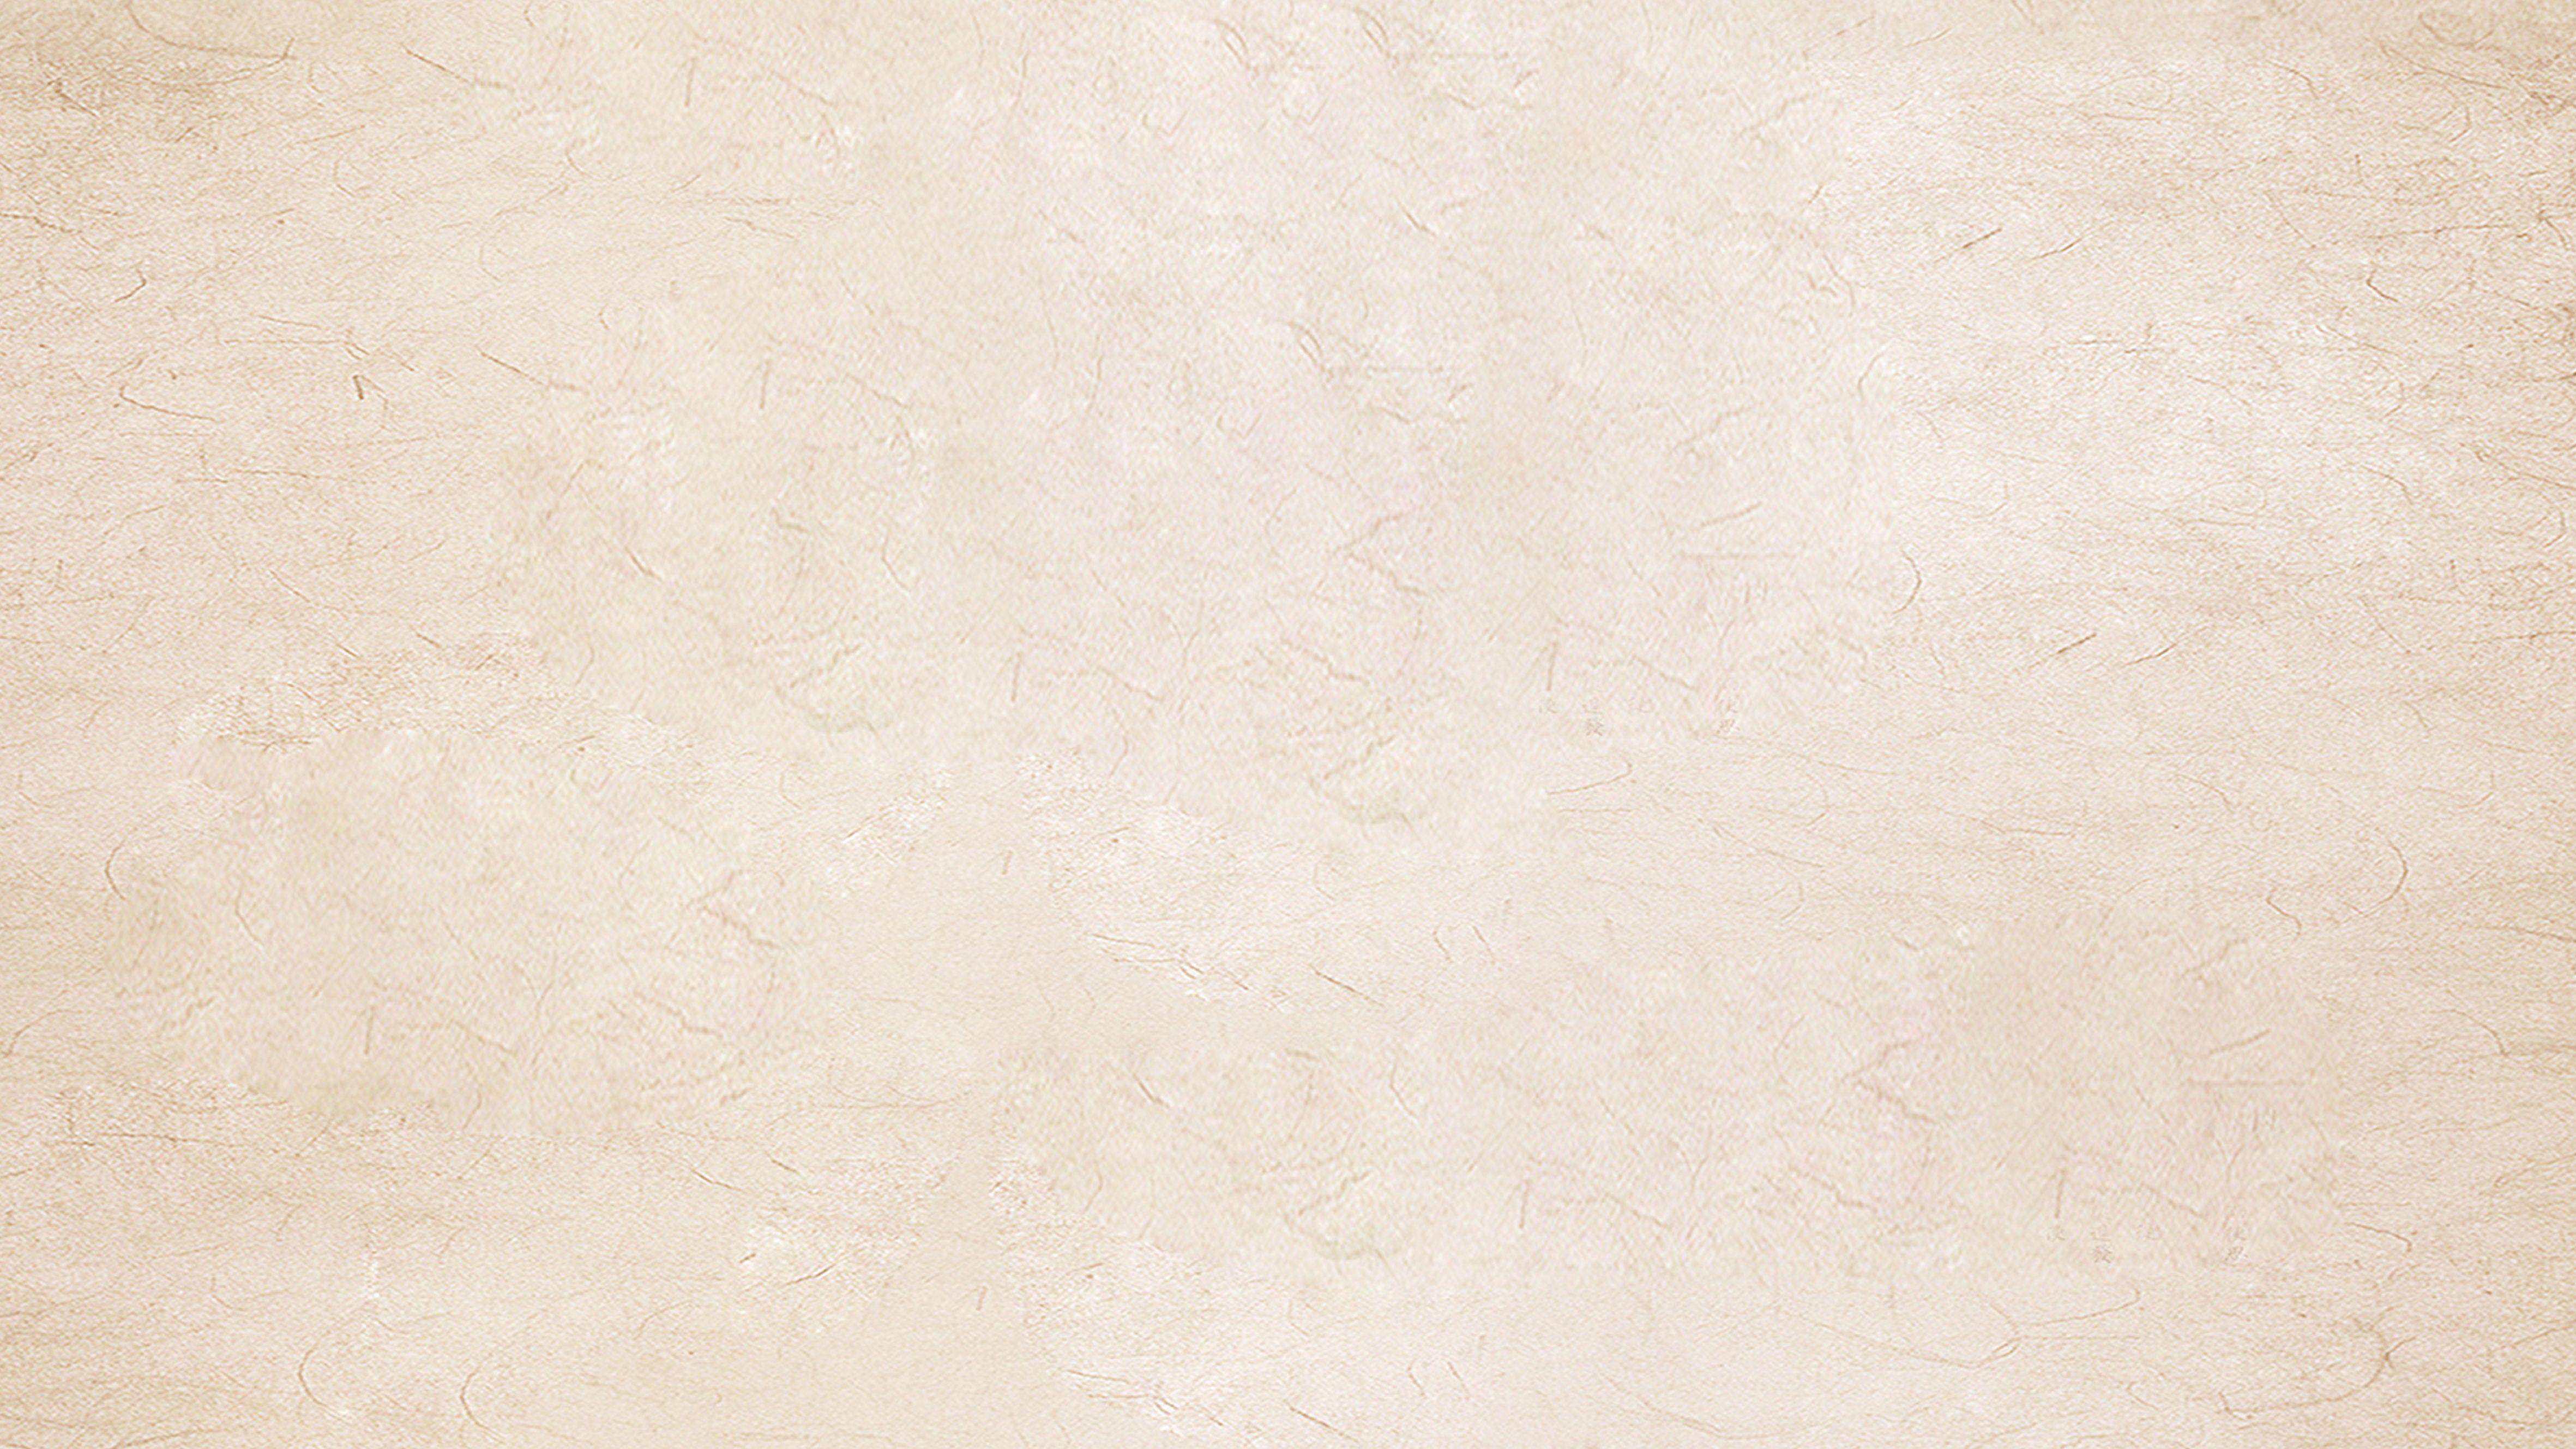 خمر تصميم ورق الكرافت الخلفية Marble Tiles Beige Tile Stone Mosaic Tile